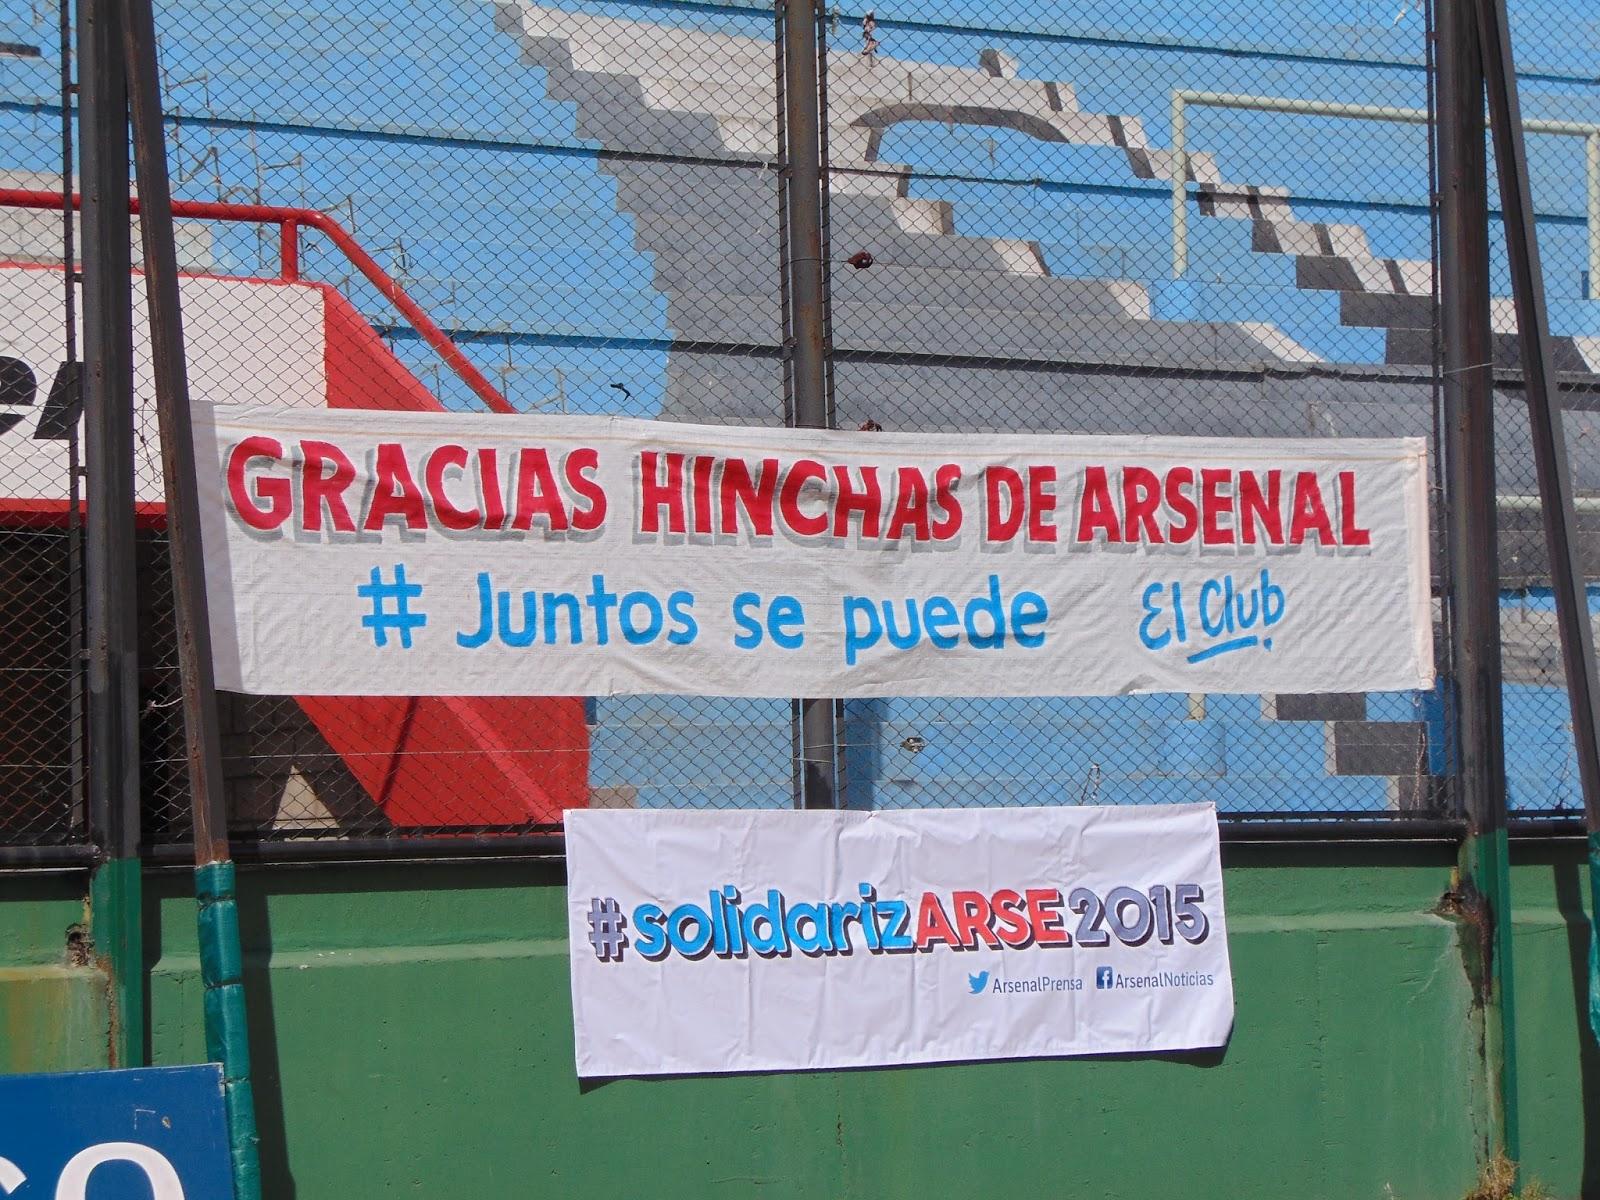 Arsenal, mística de primerA